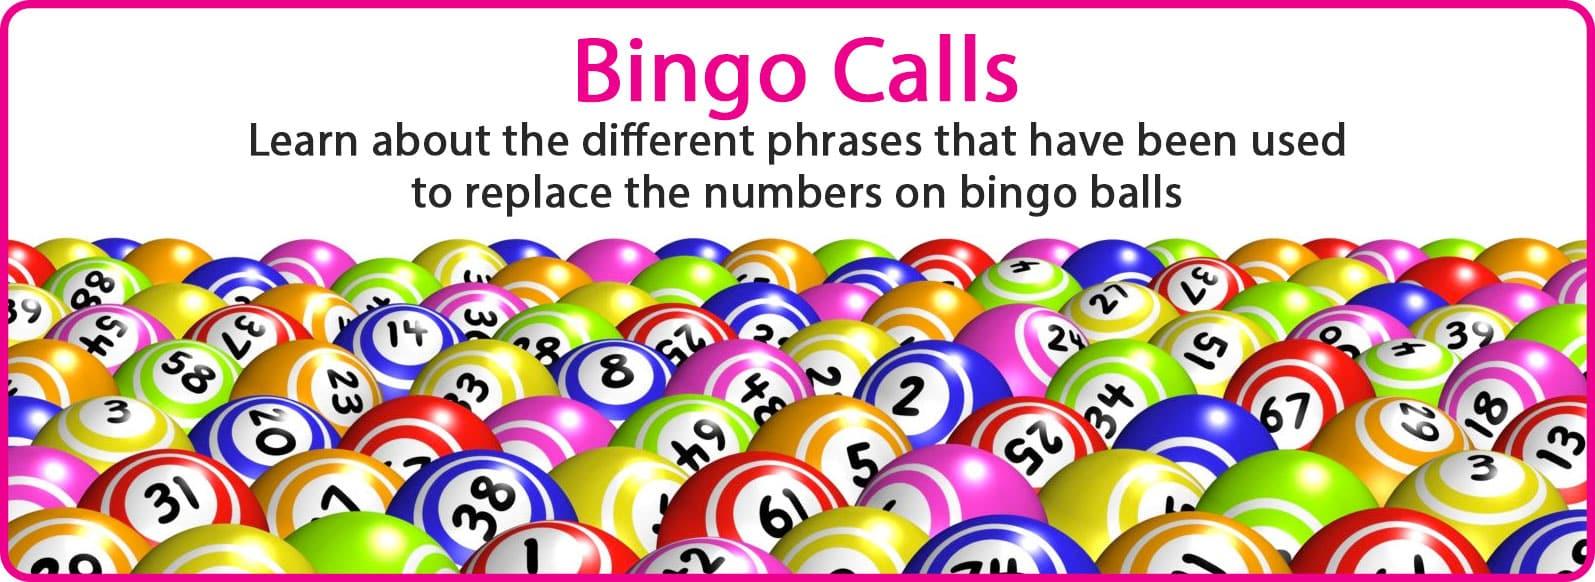 Bingo Calls - The Complete List of Funny Bingo Nicknames